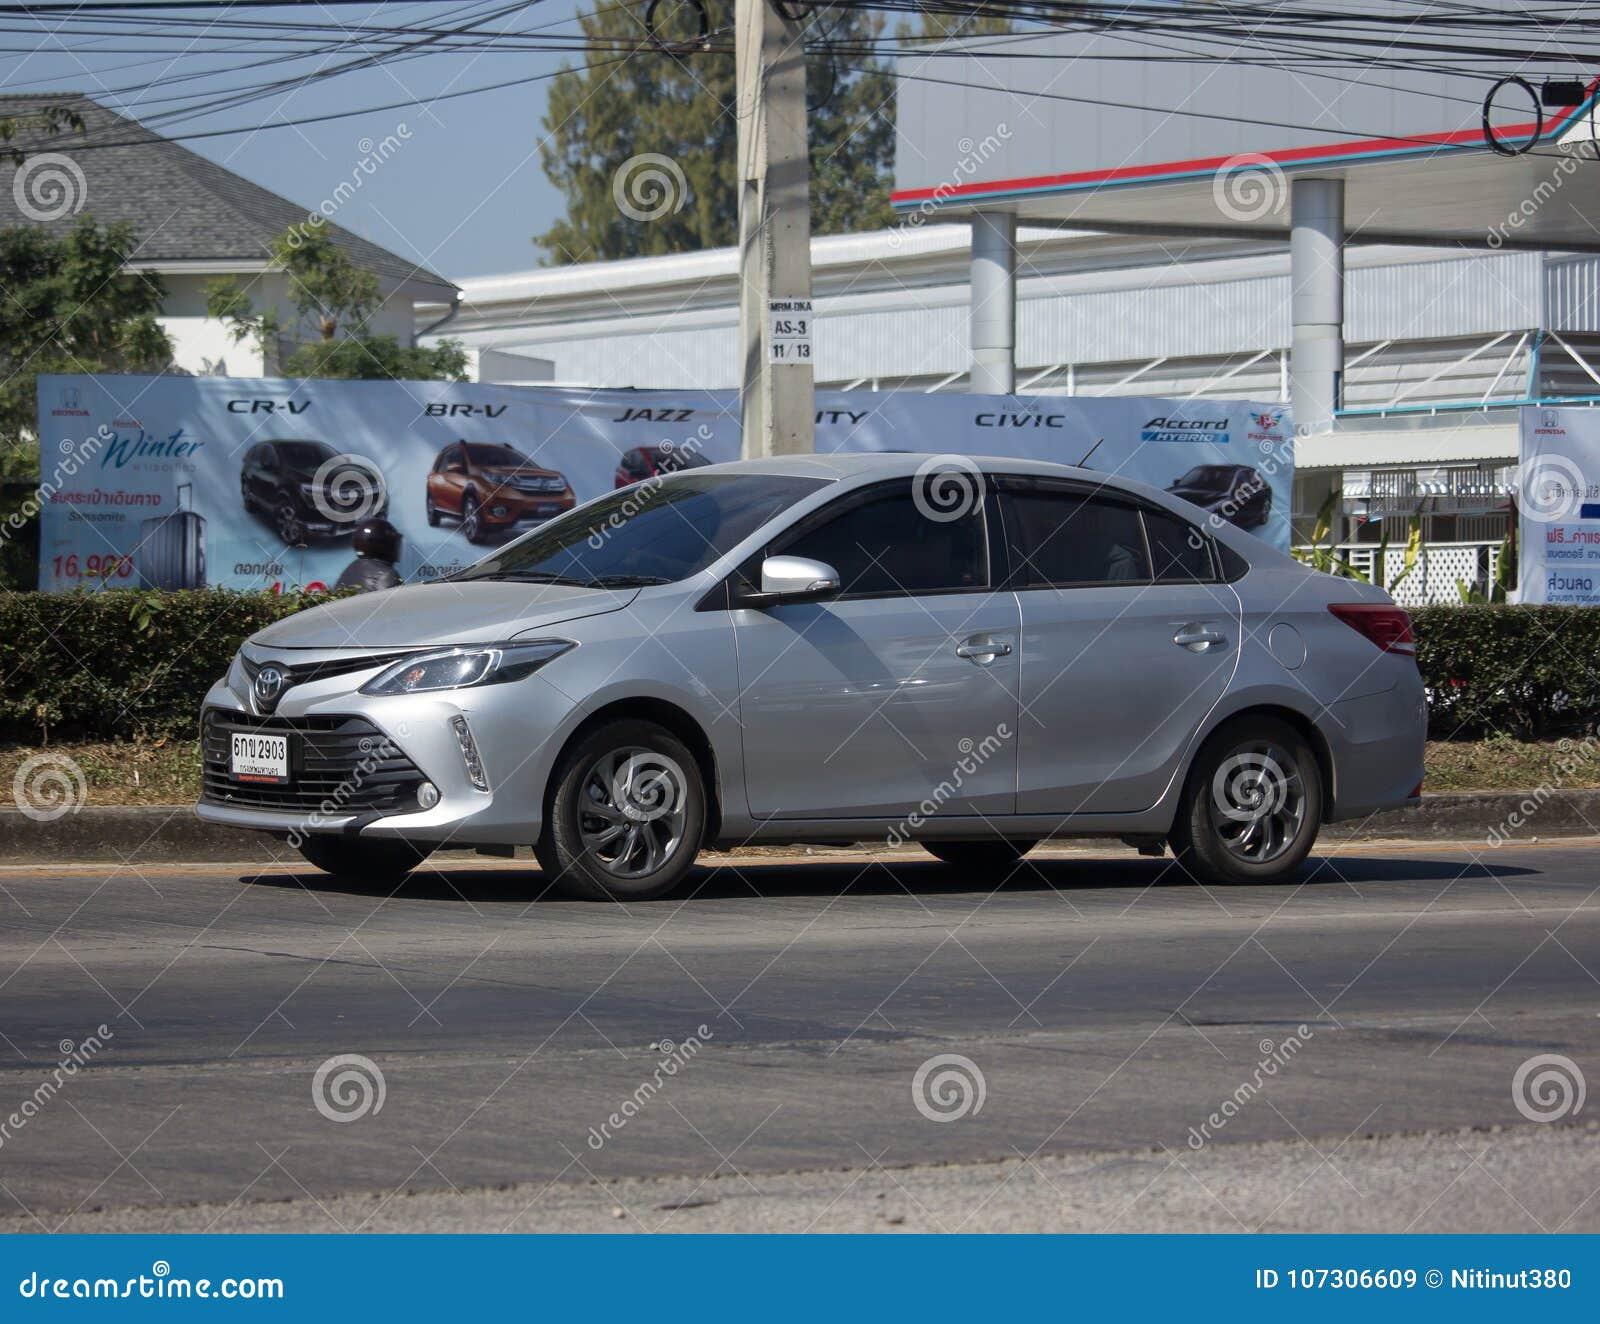 Private Sedan Car Toyota Vios  Editorial Stock Image - Image